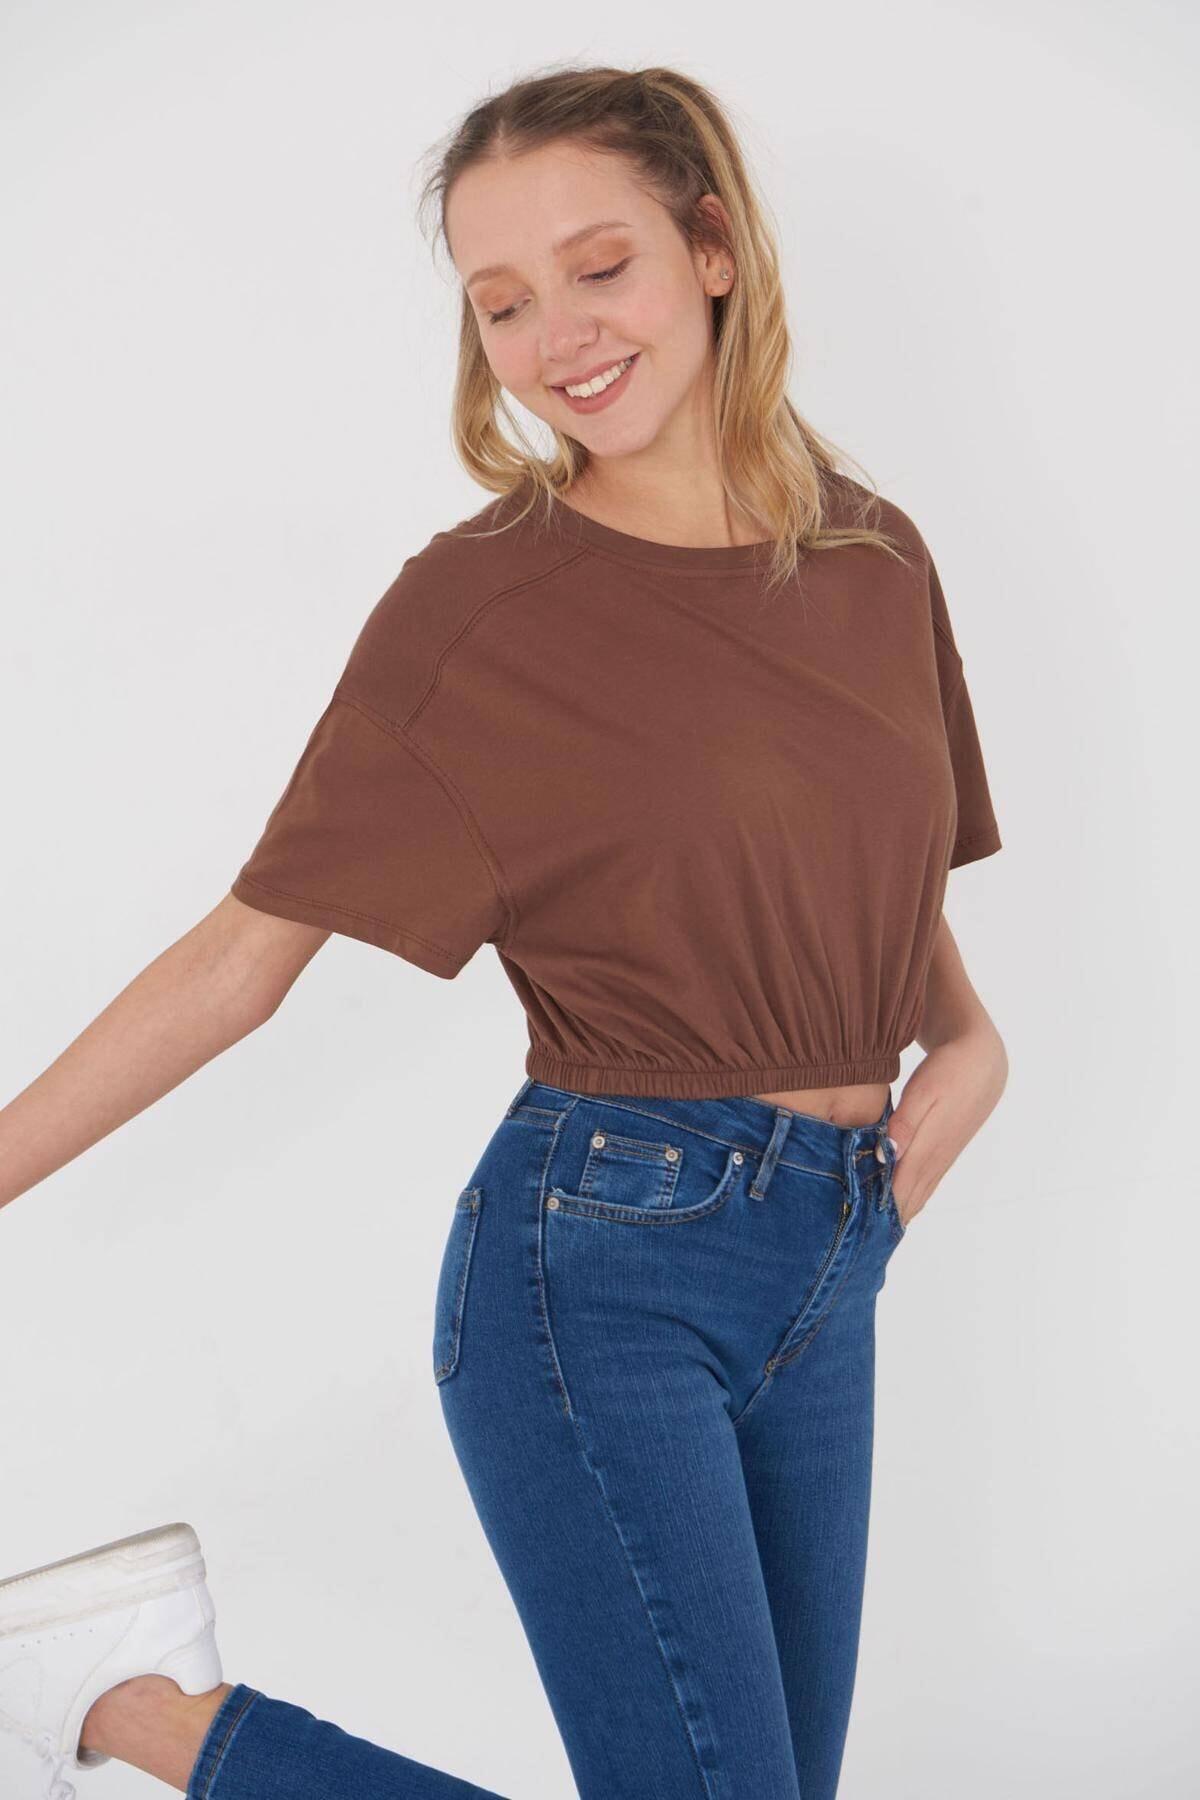 Addax Kadın Kahve Basic T-Shirt B102 - J7 Adx-0000023867 2